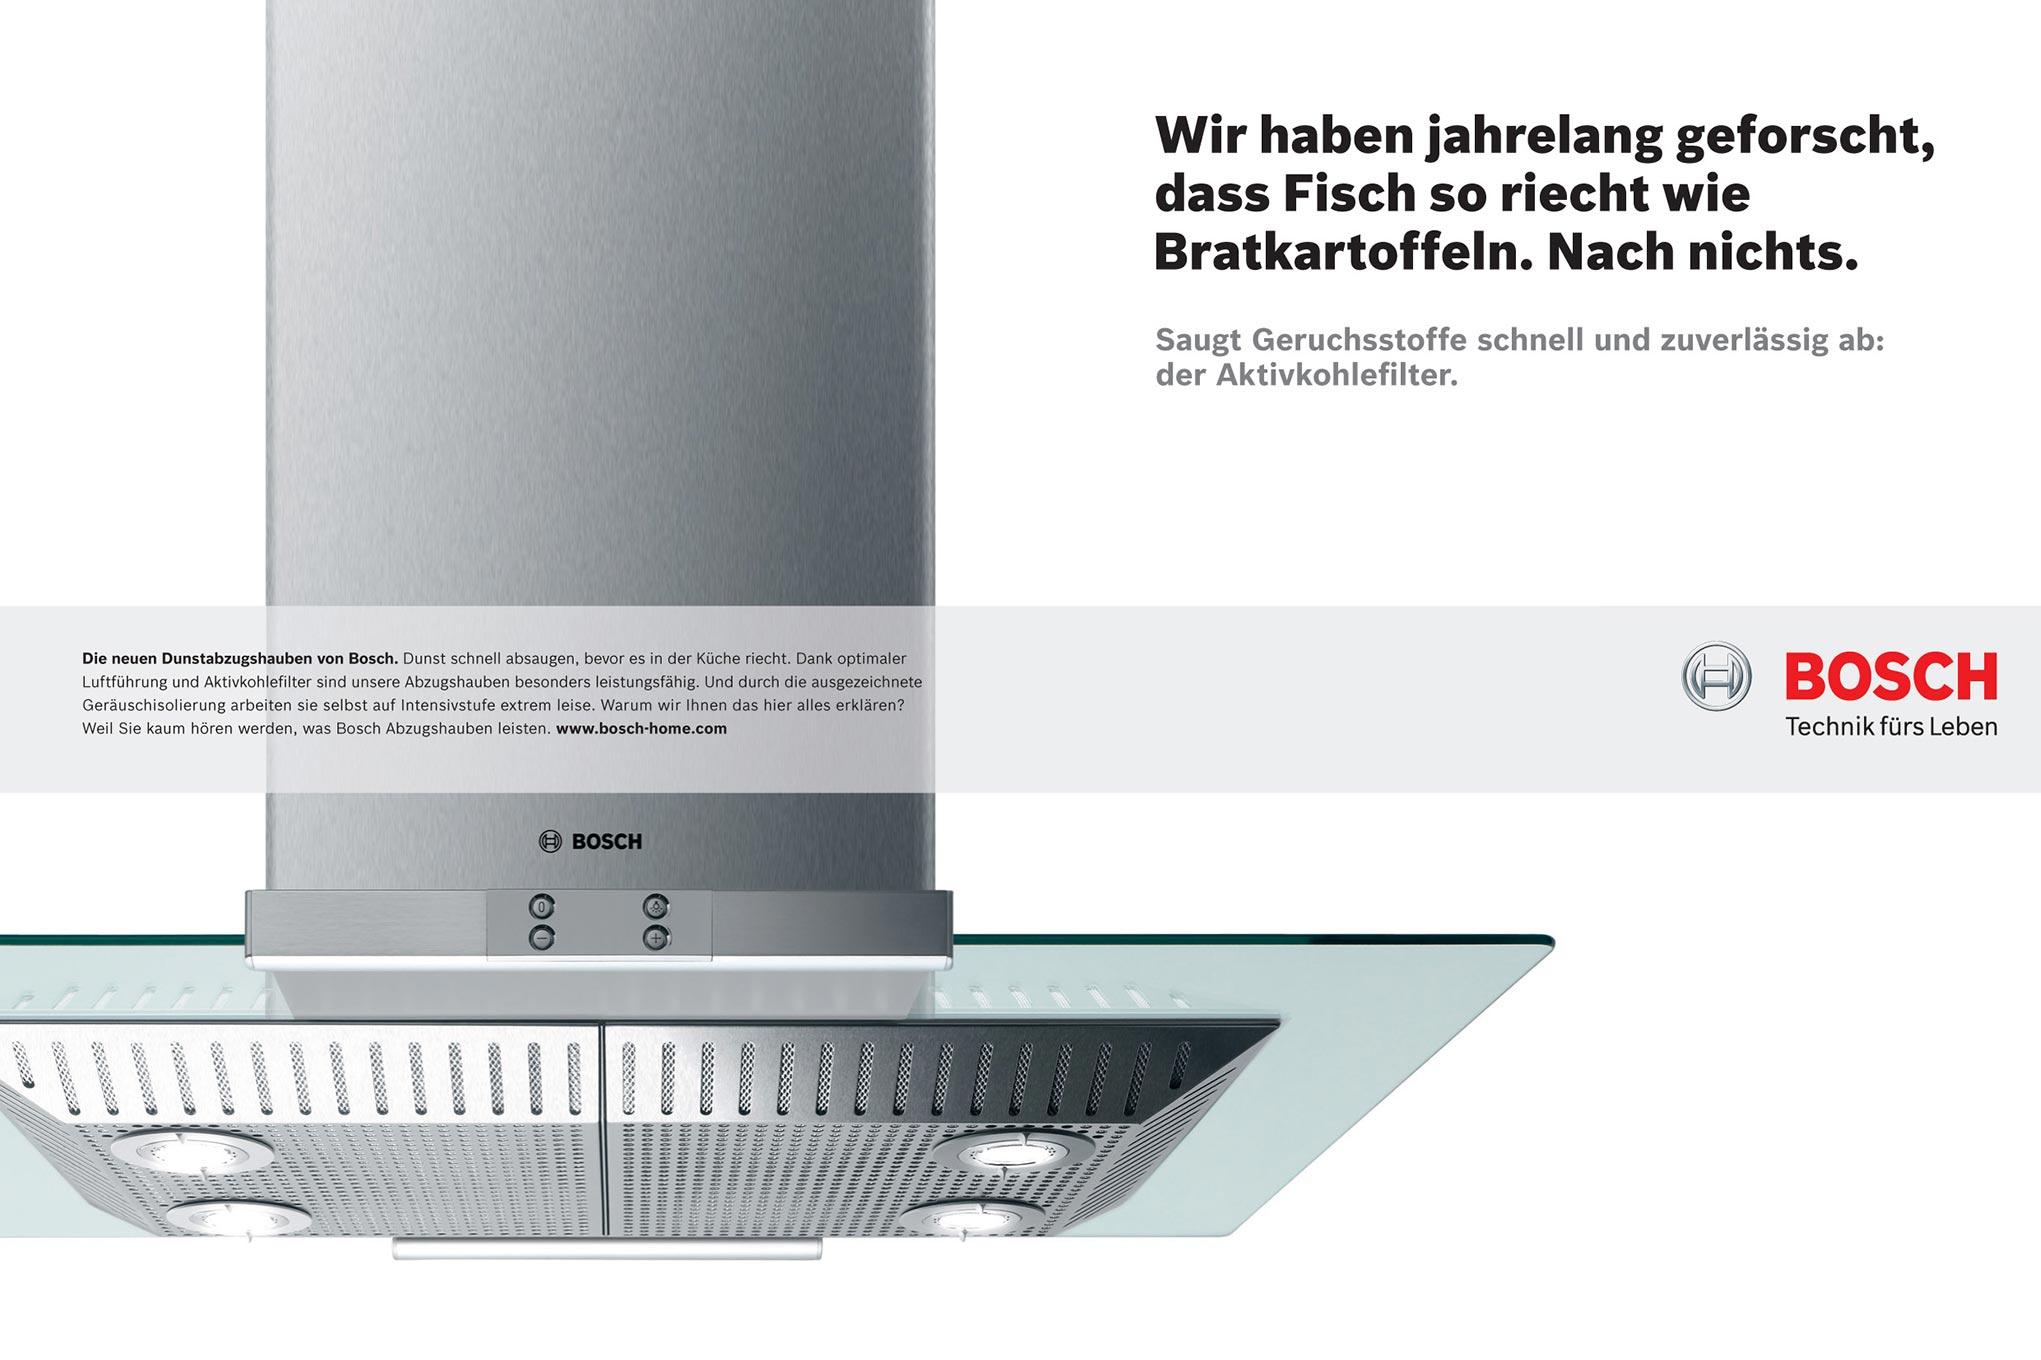 Bosch, Image Kampagne, Agentur: DDB Berlin